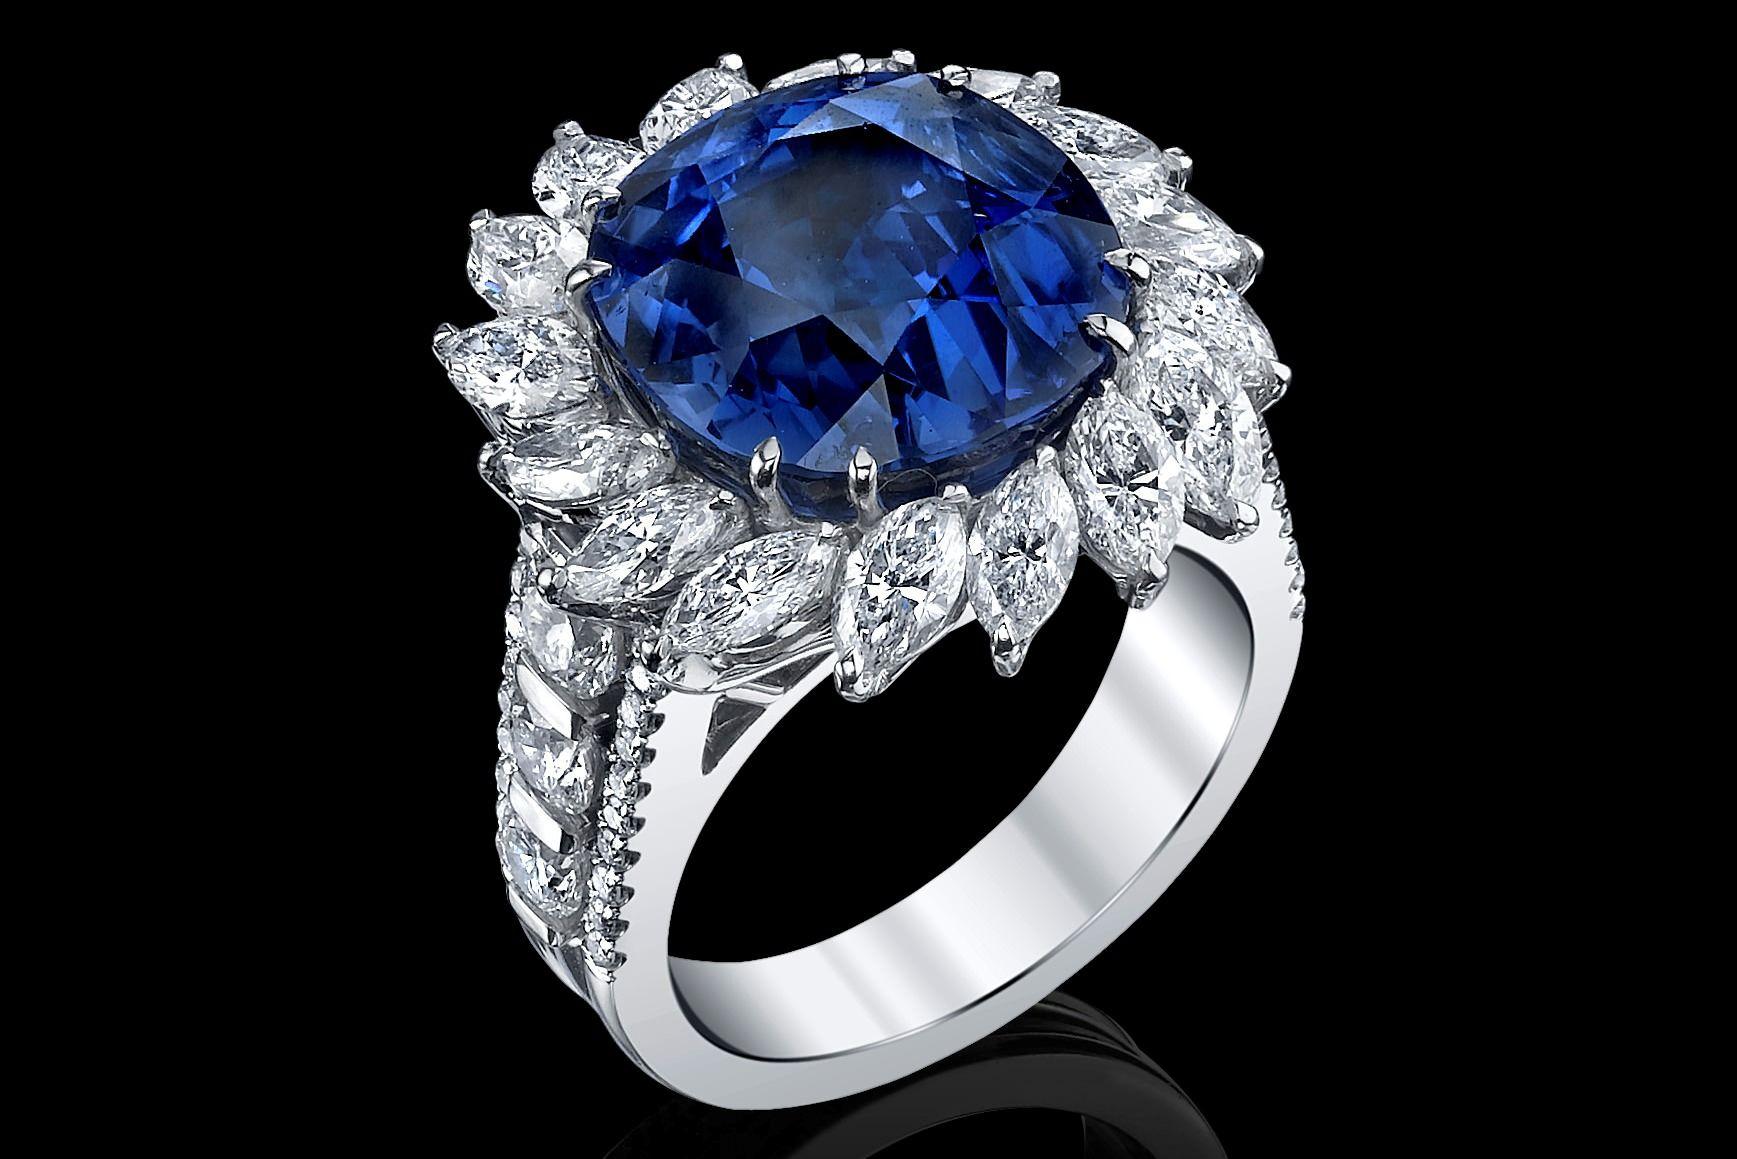 Best Colored Gemstones for Engagement Rings Gemstone